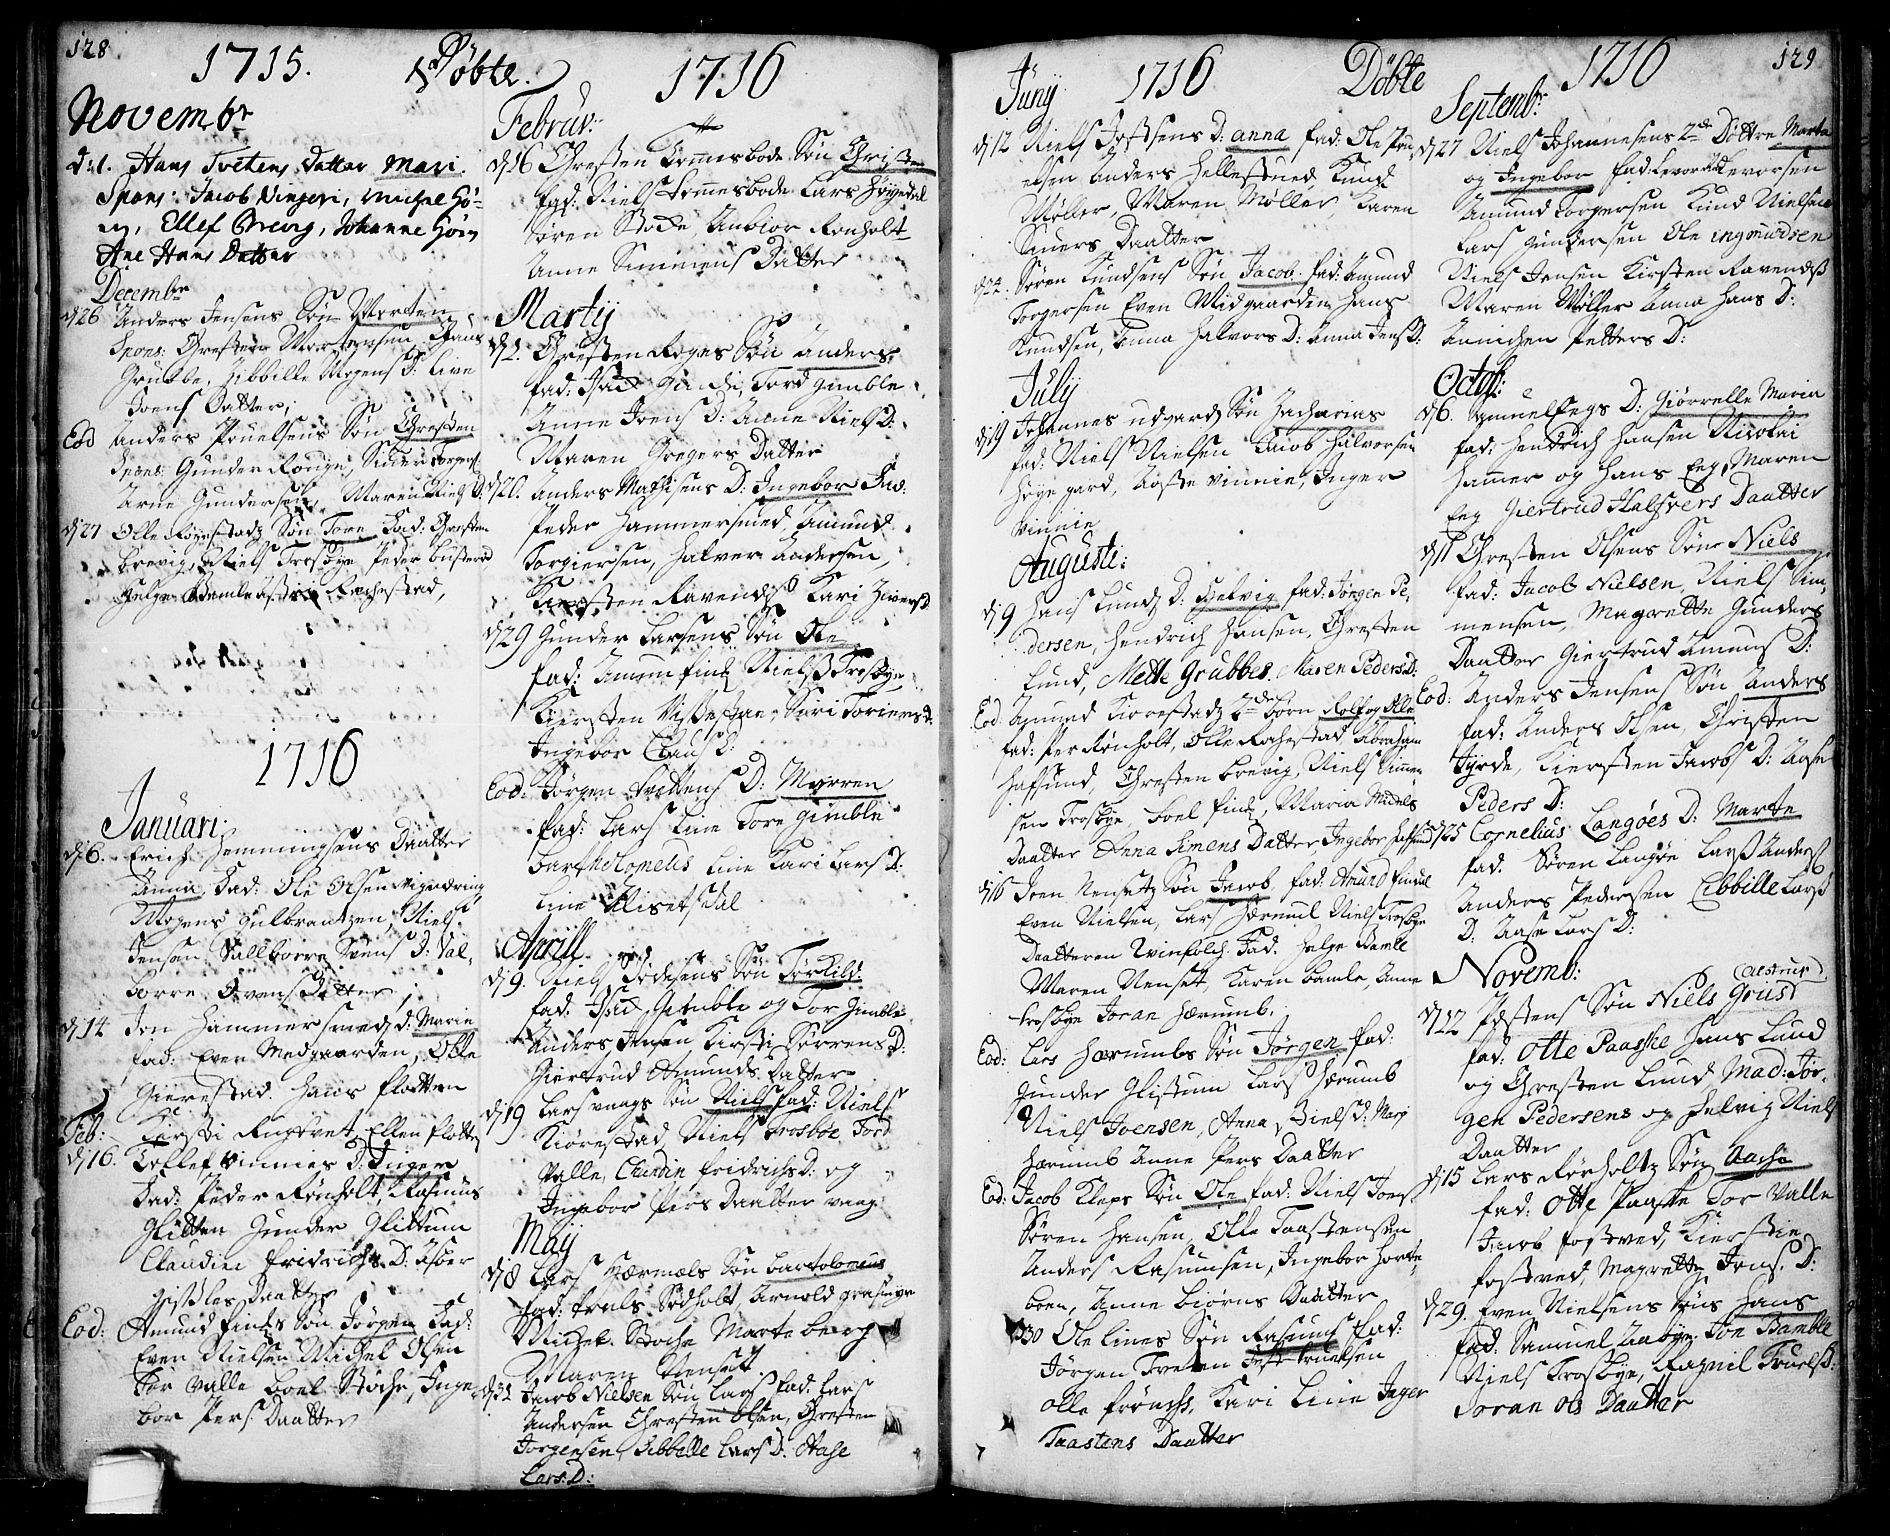 SAKO, Bamble kirkebøker, F/Fa/L0001: Ministerialbok nr. I 1, 1702-1774, s. 128-129